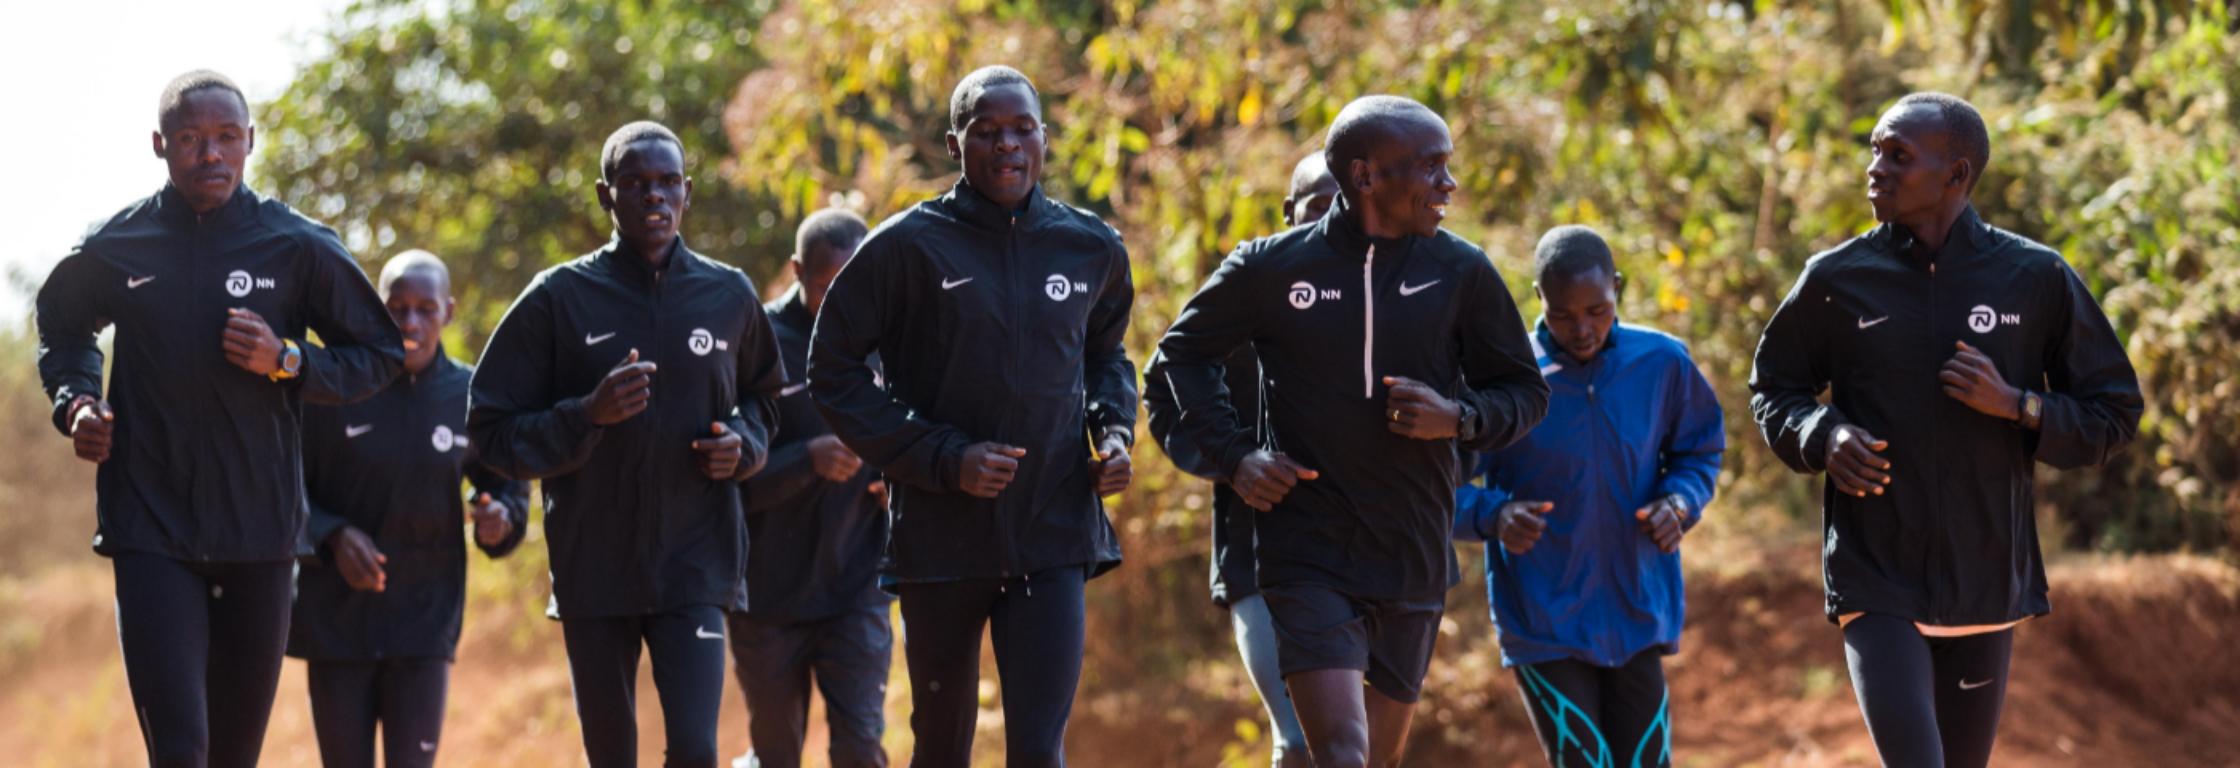 Loop samen met het NN Running Team een virtuele marathon